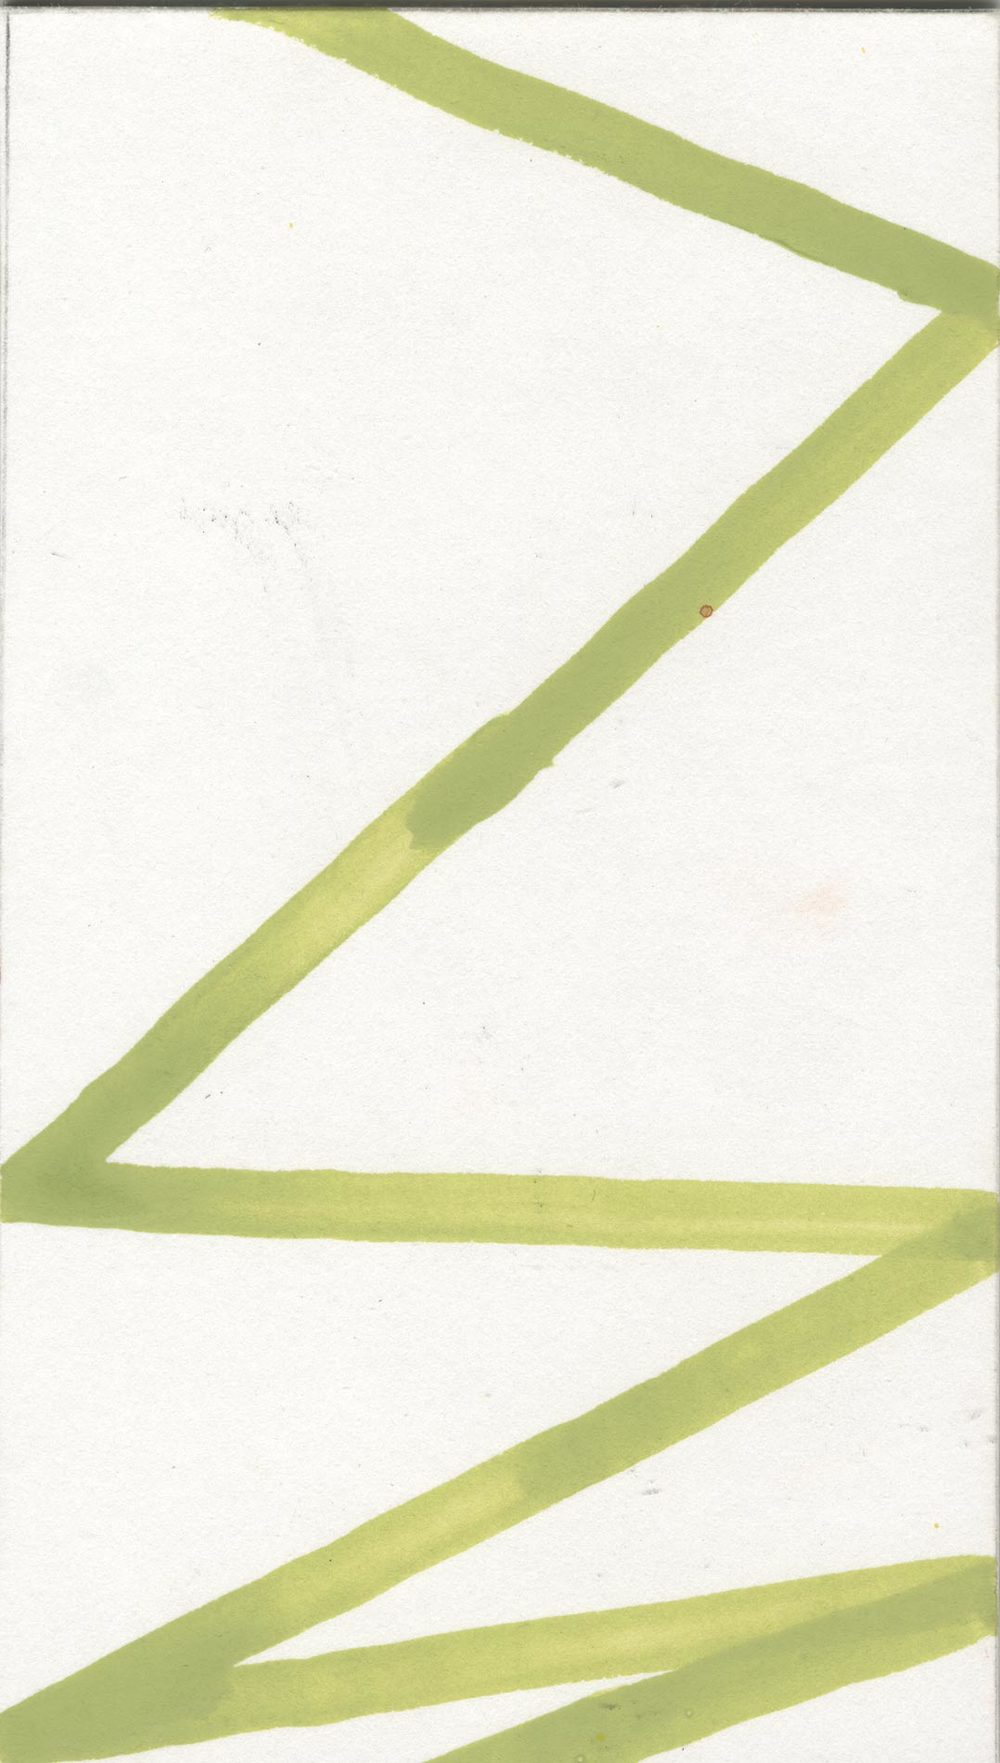 zig-zag-green.jpg